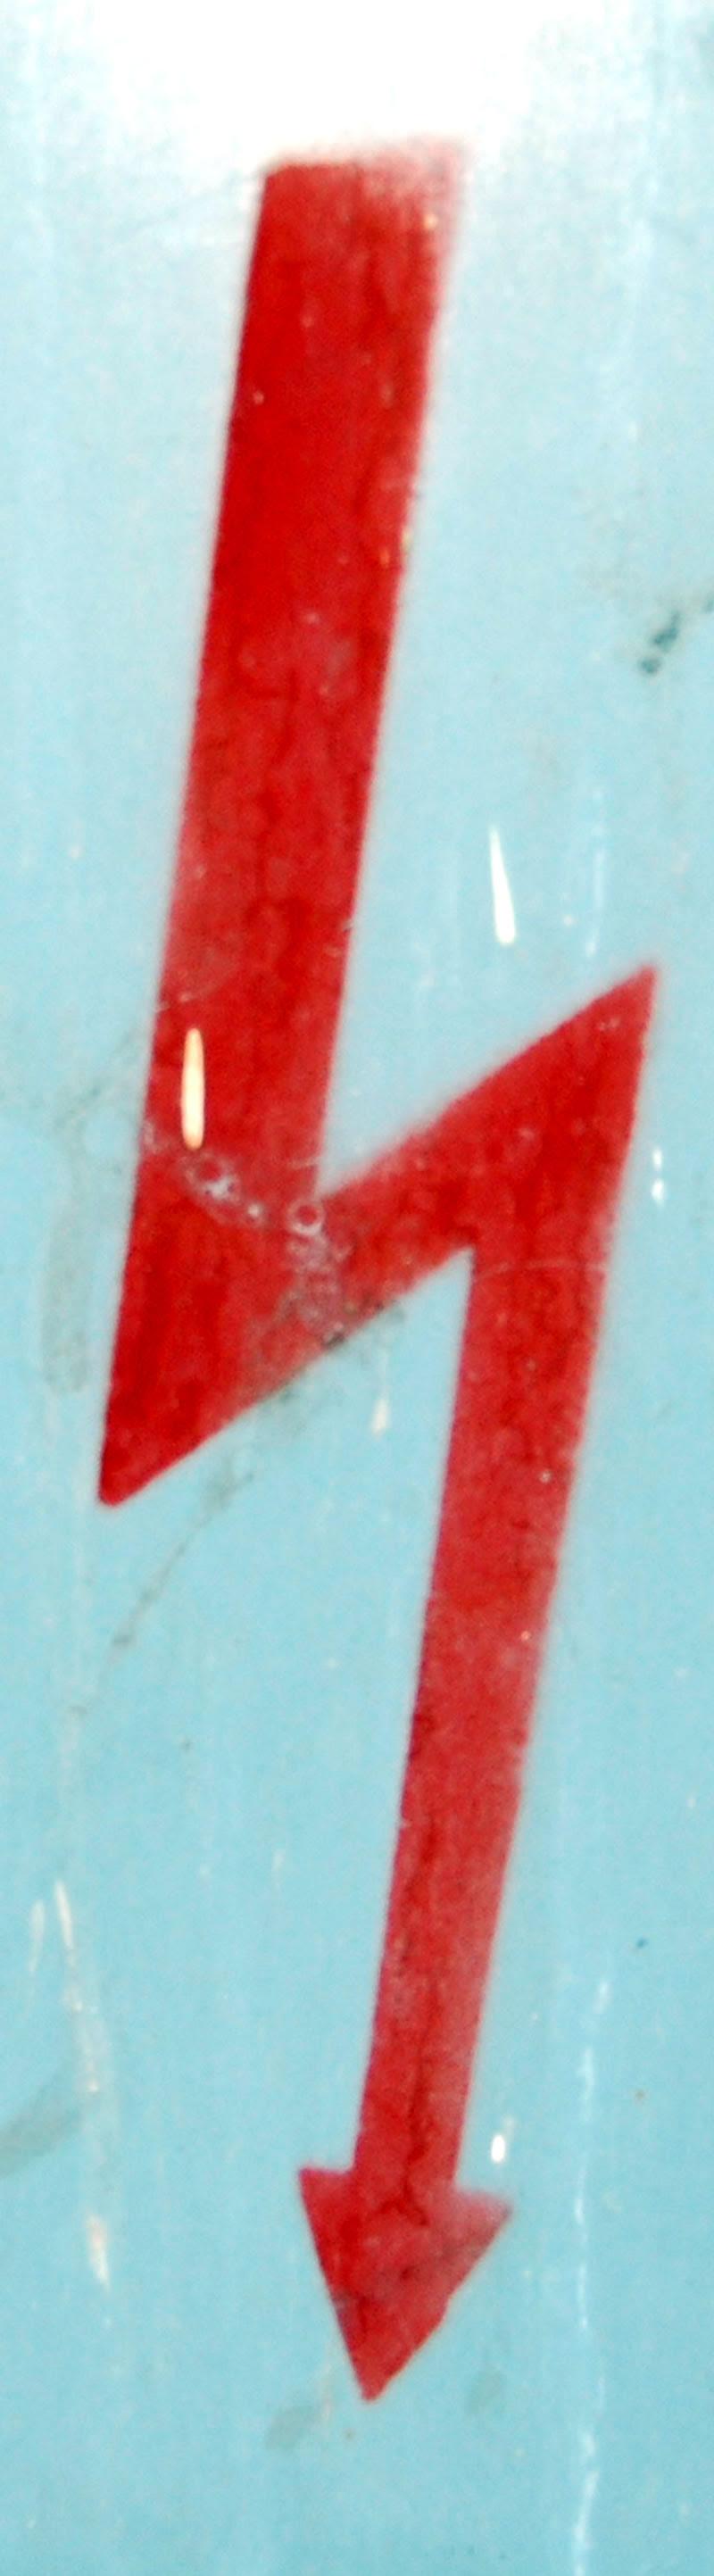 red-bolt